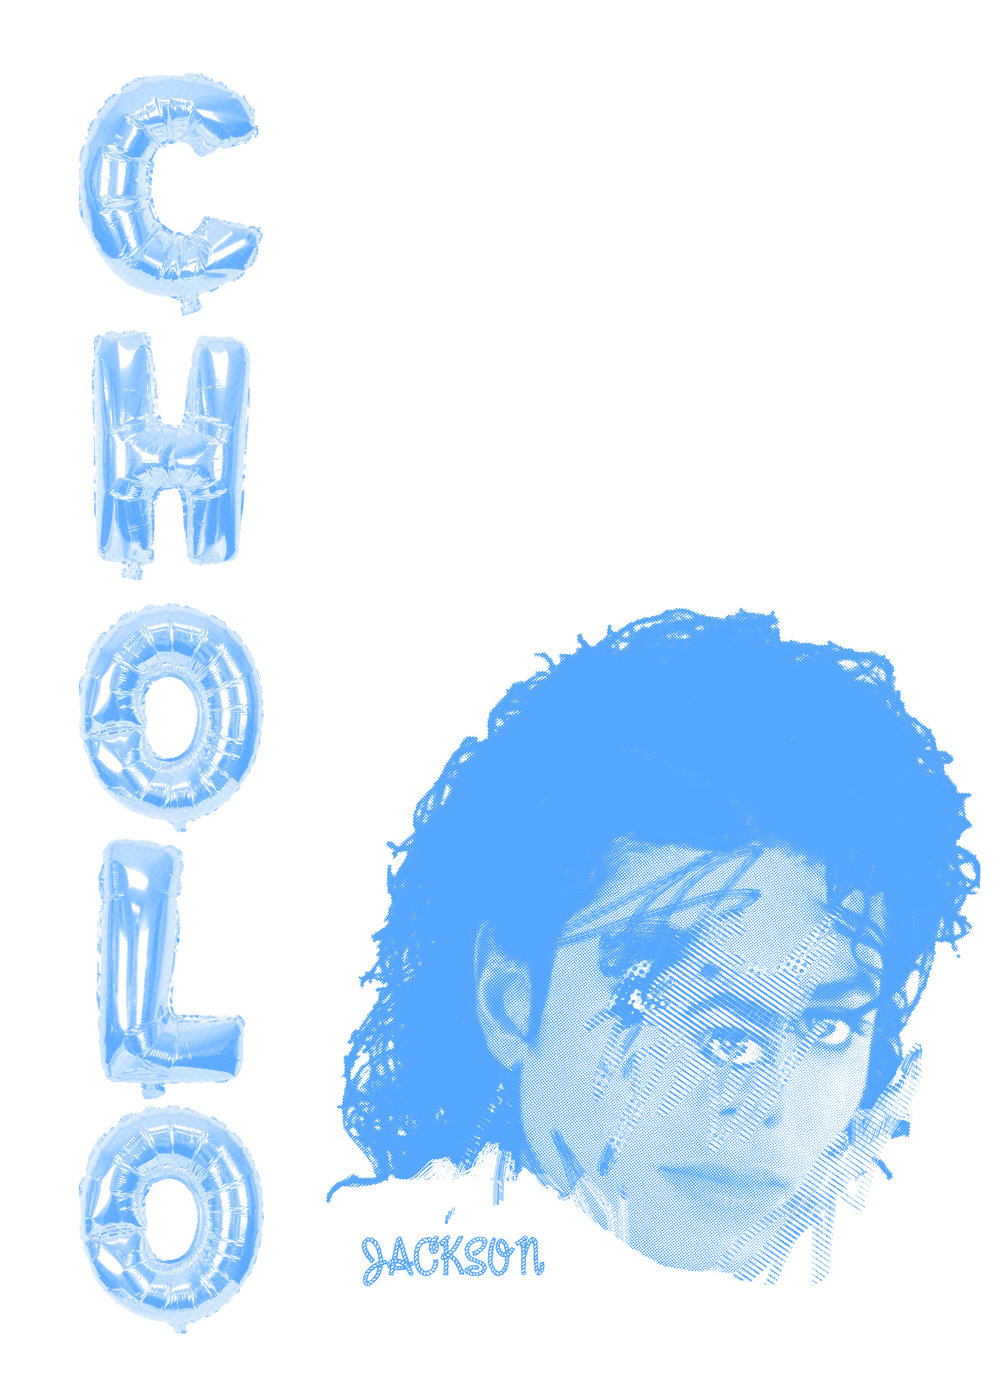 cholo jackson 1 web copy.jpg